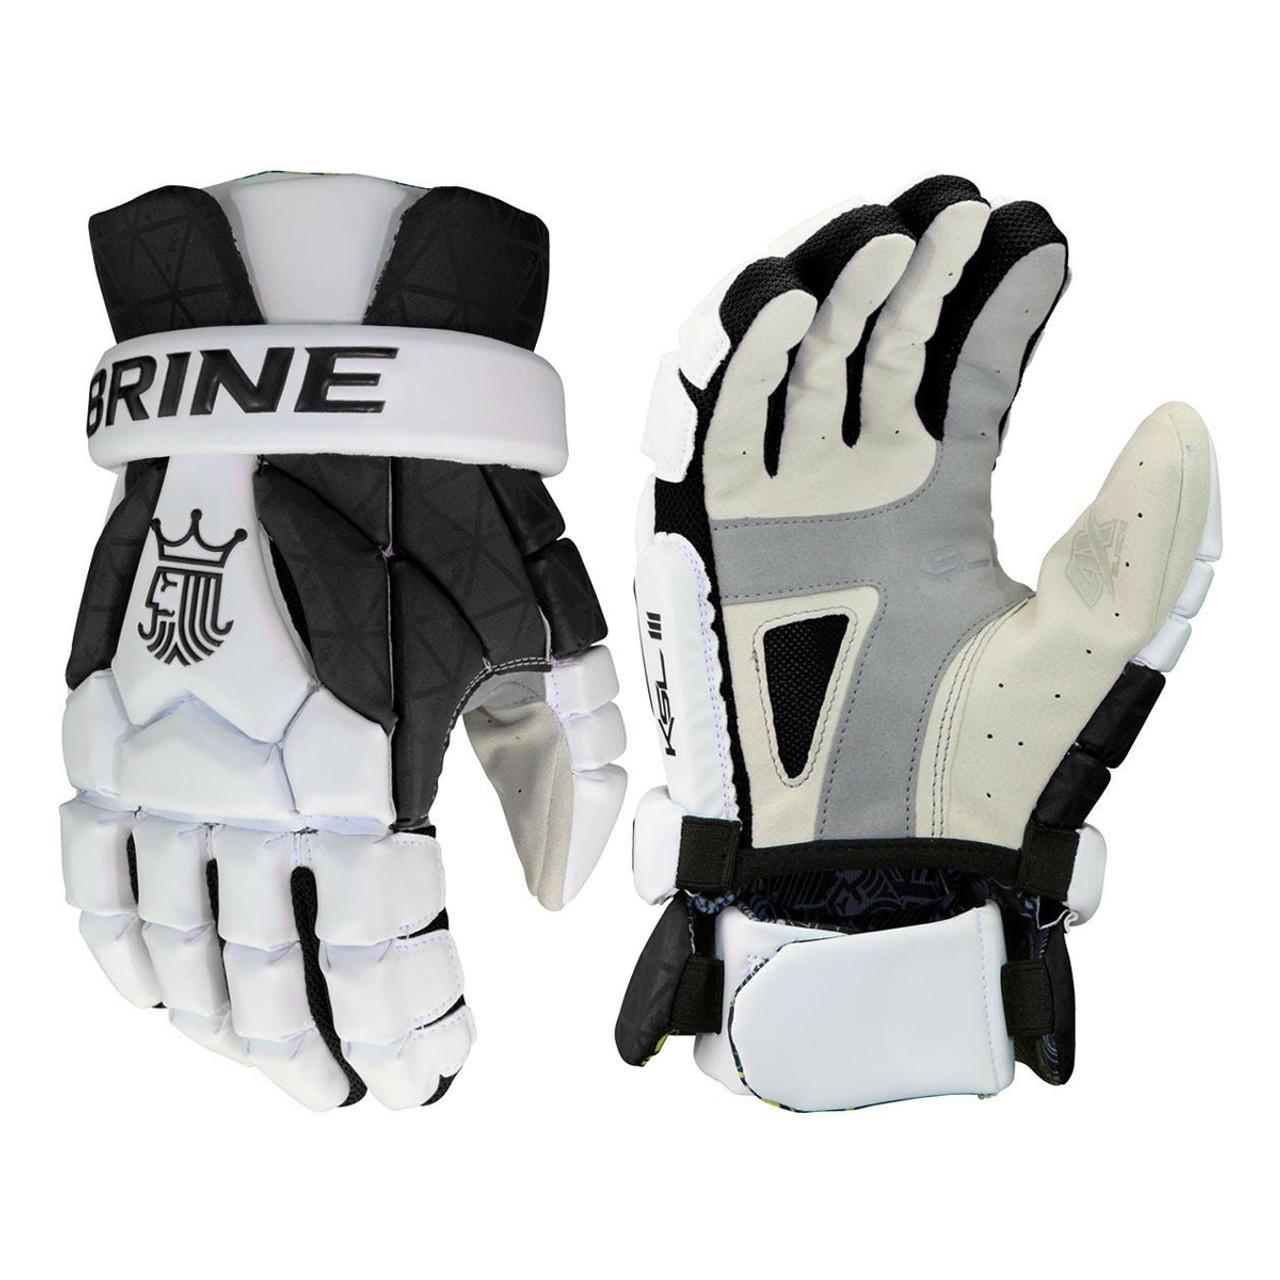 NEW list @ $99.99 Various Colors STX K-18 015 Junior Lacrosse Gloves